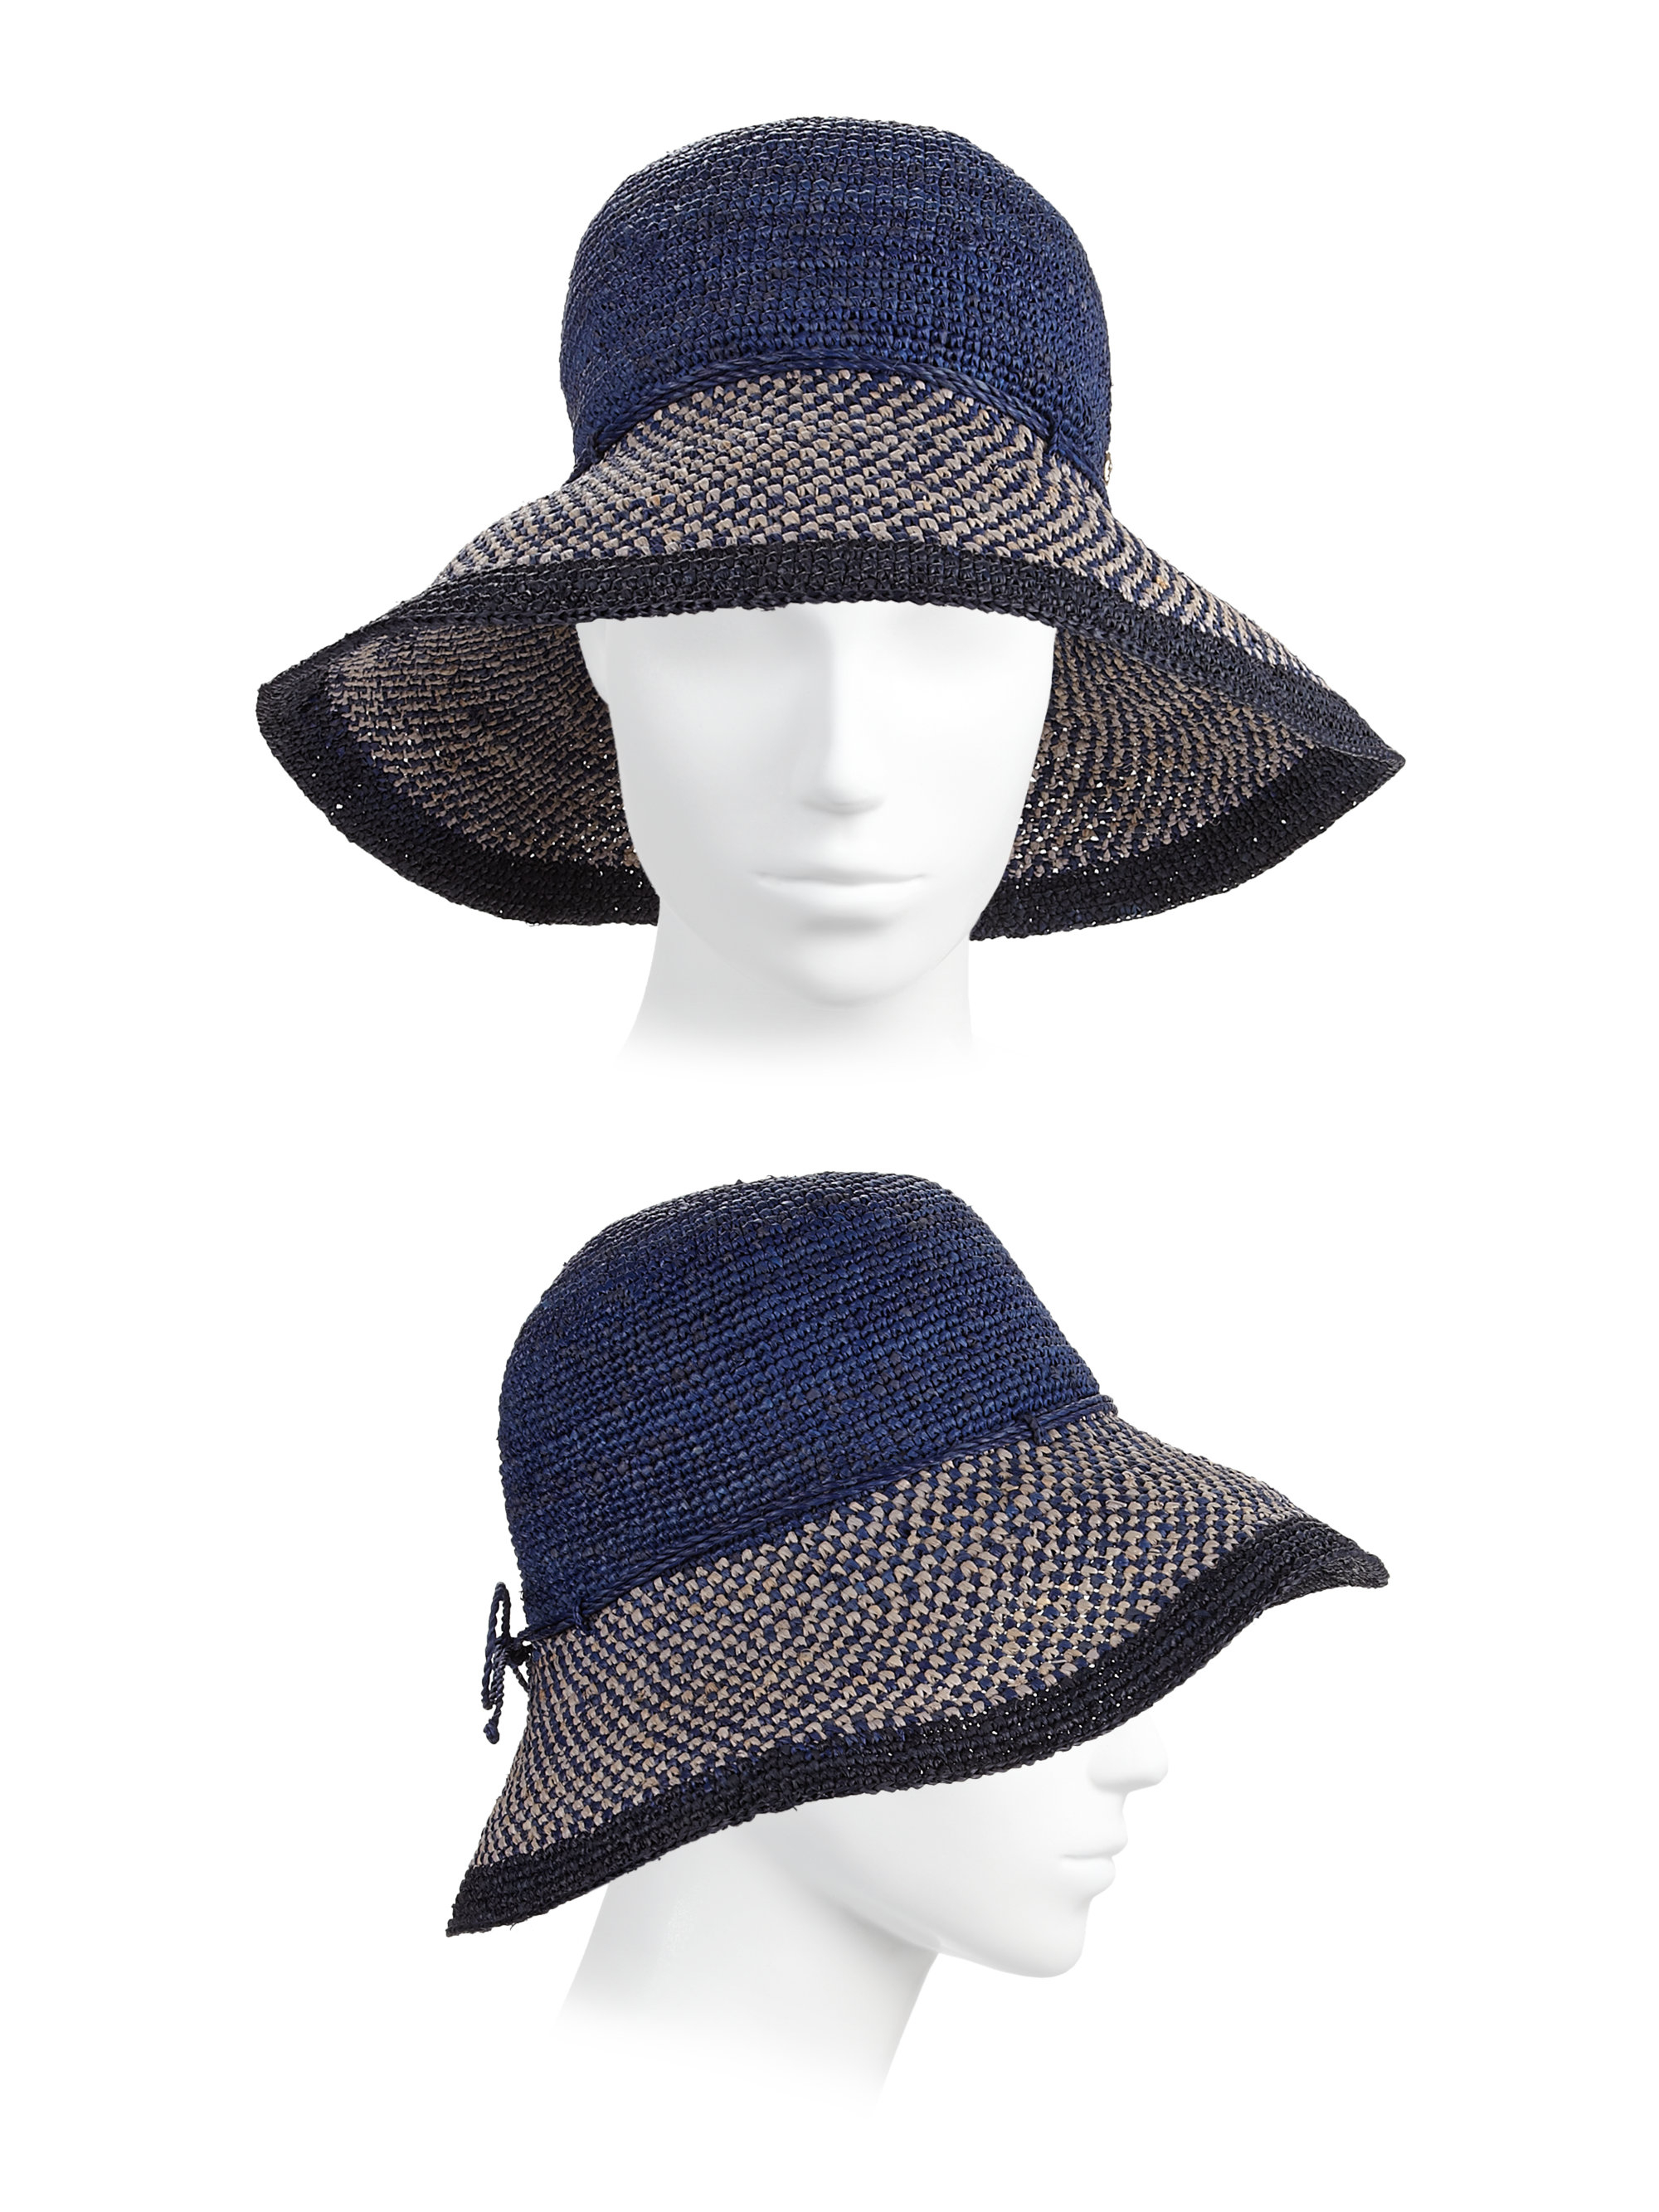 196f355049ccc Helen Kaminski Provence 10 Raffia Sun Hat in Blue - Lyst